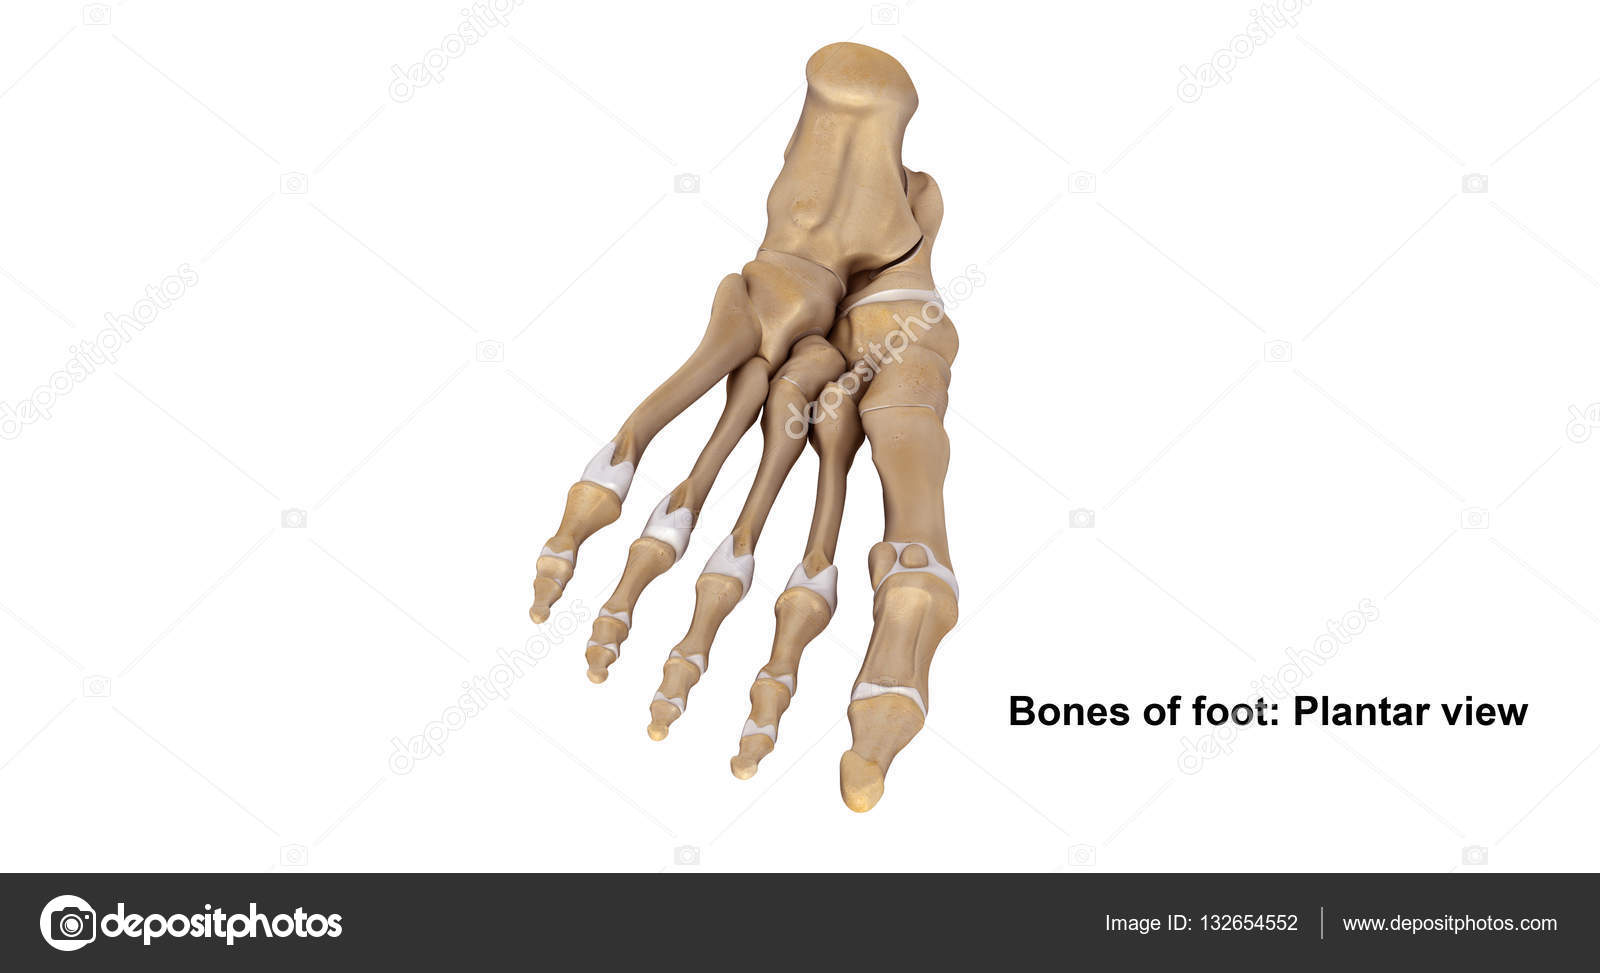 Skeleton Foot Planter view — Stock Photo © sciencepics #132654552